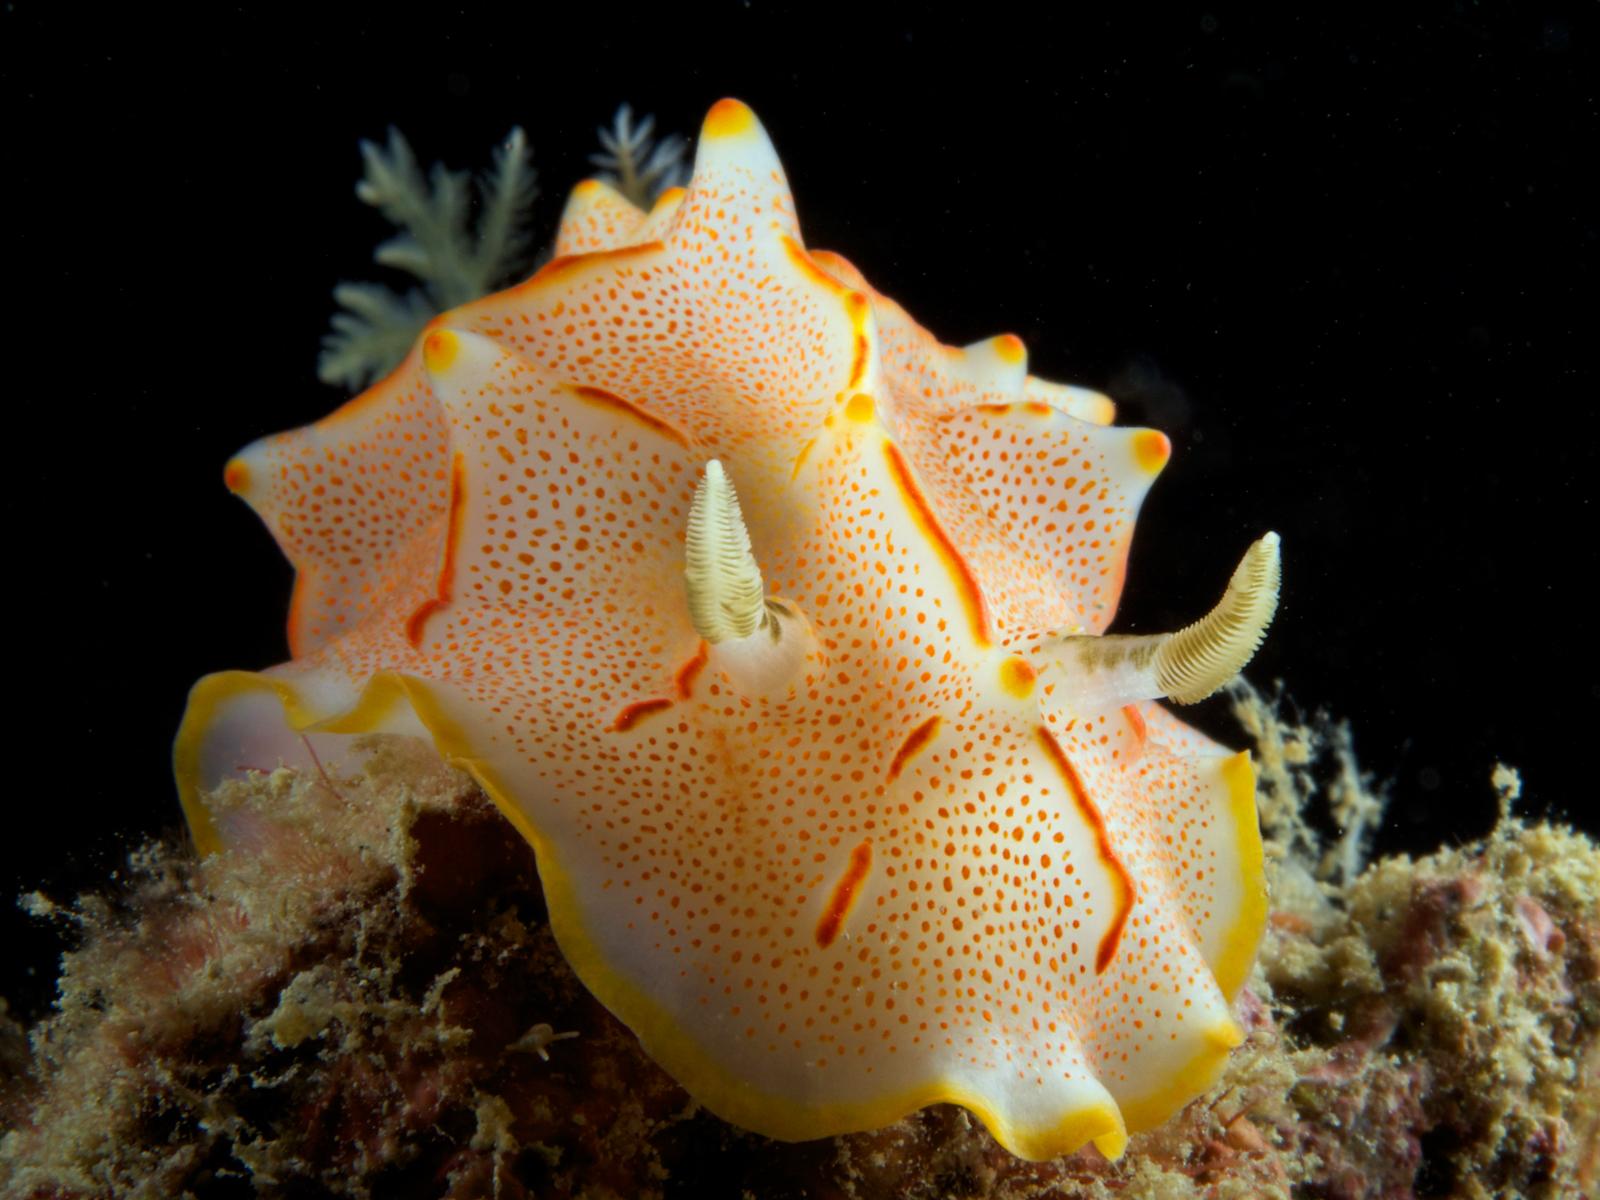 Nudibrach - Halgerda bacalusia